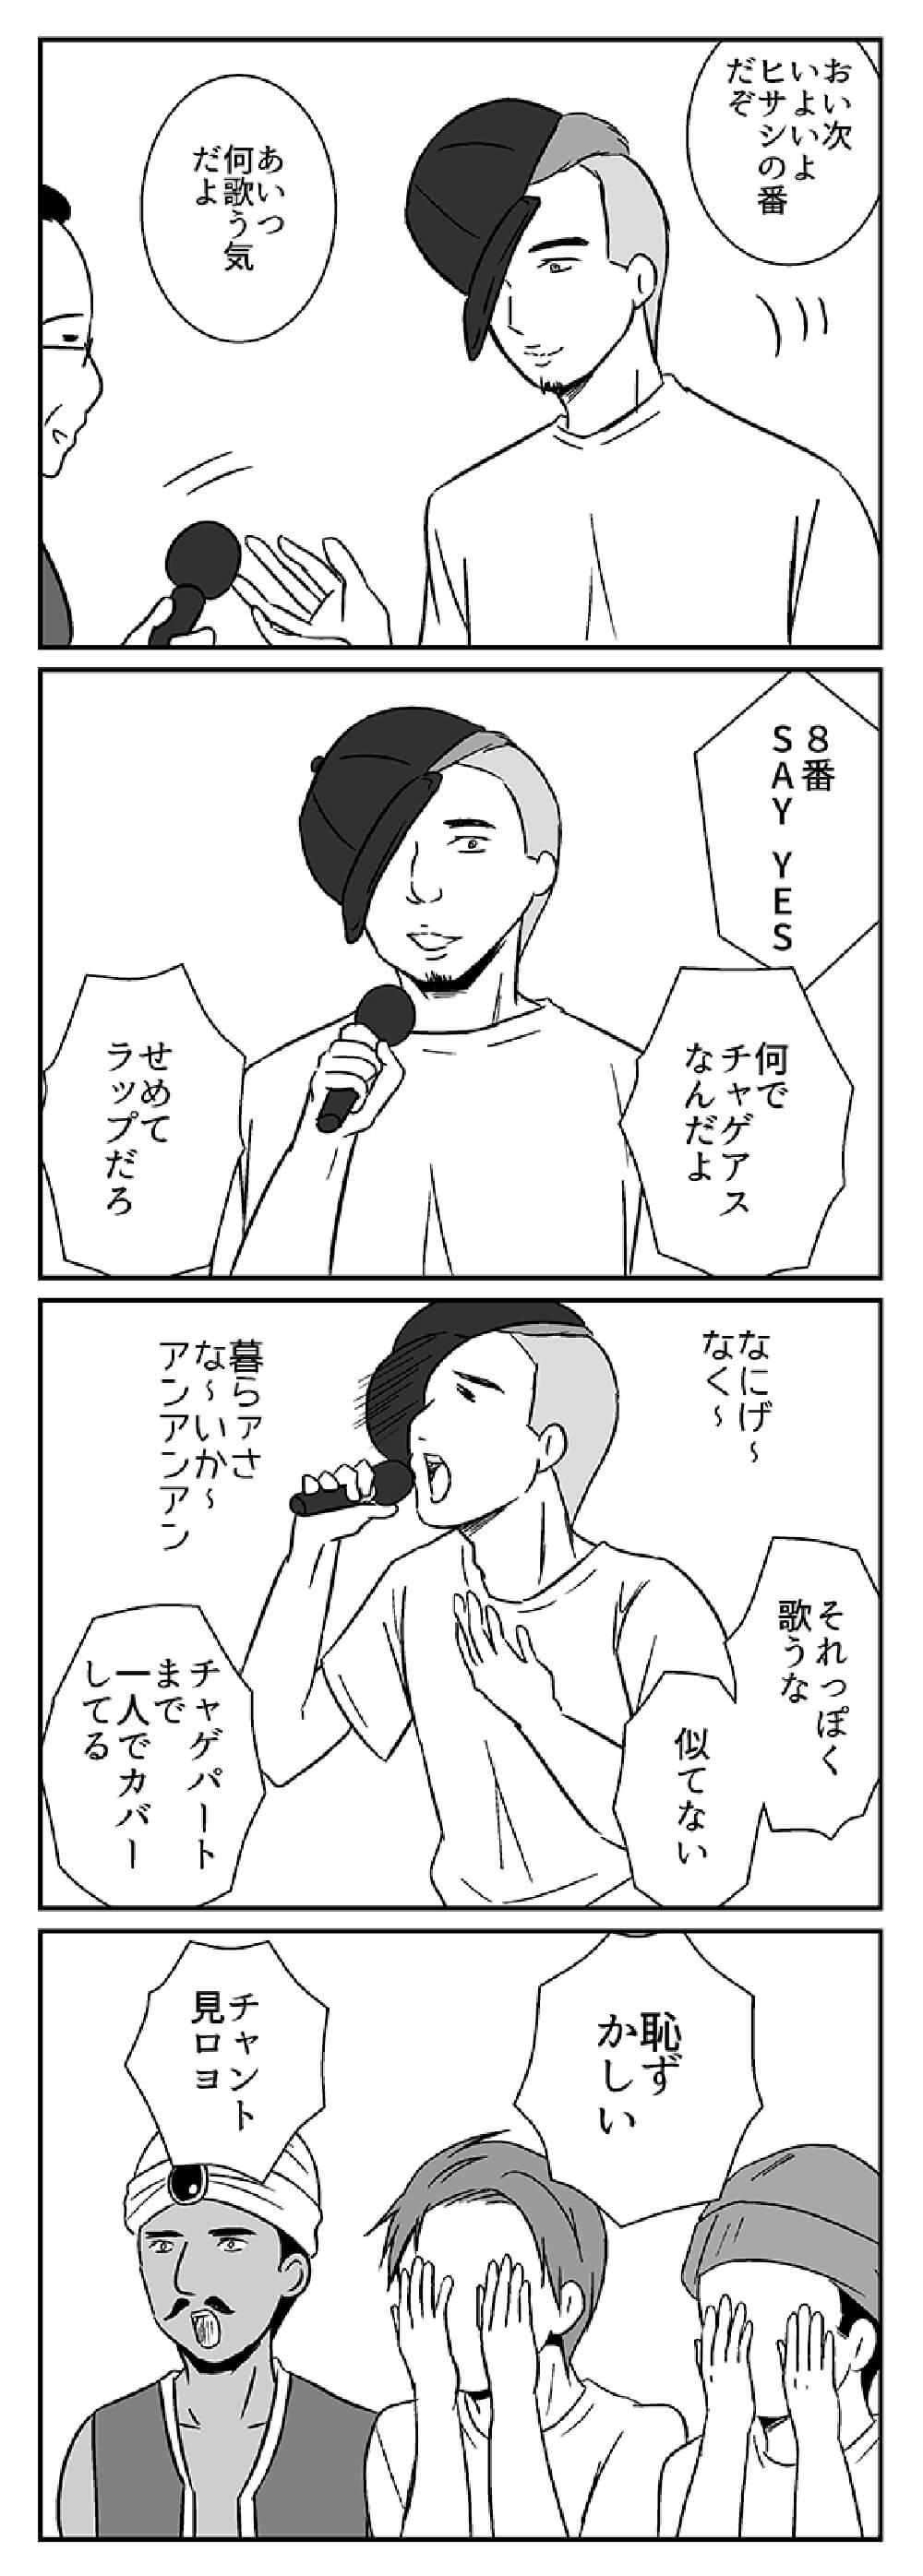 hisashi3_width1000